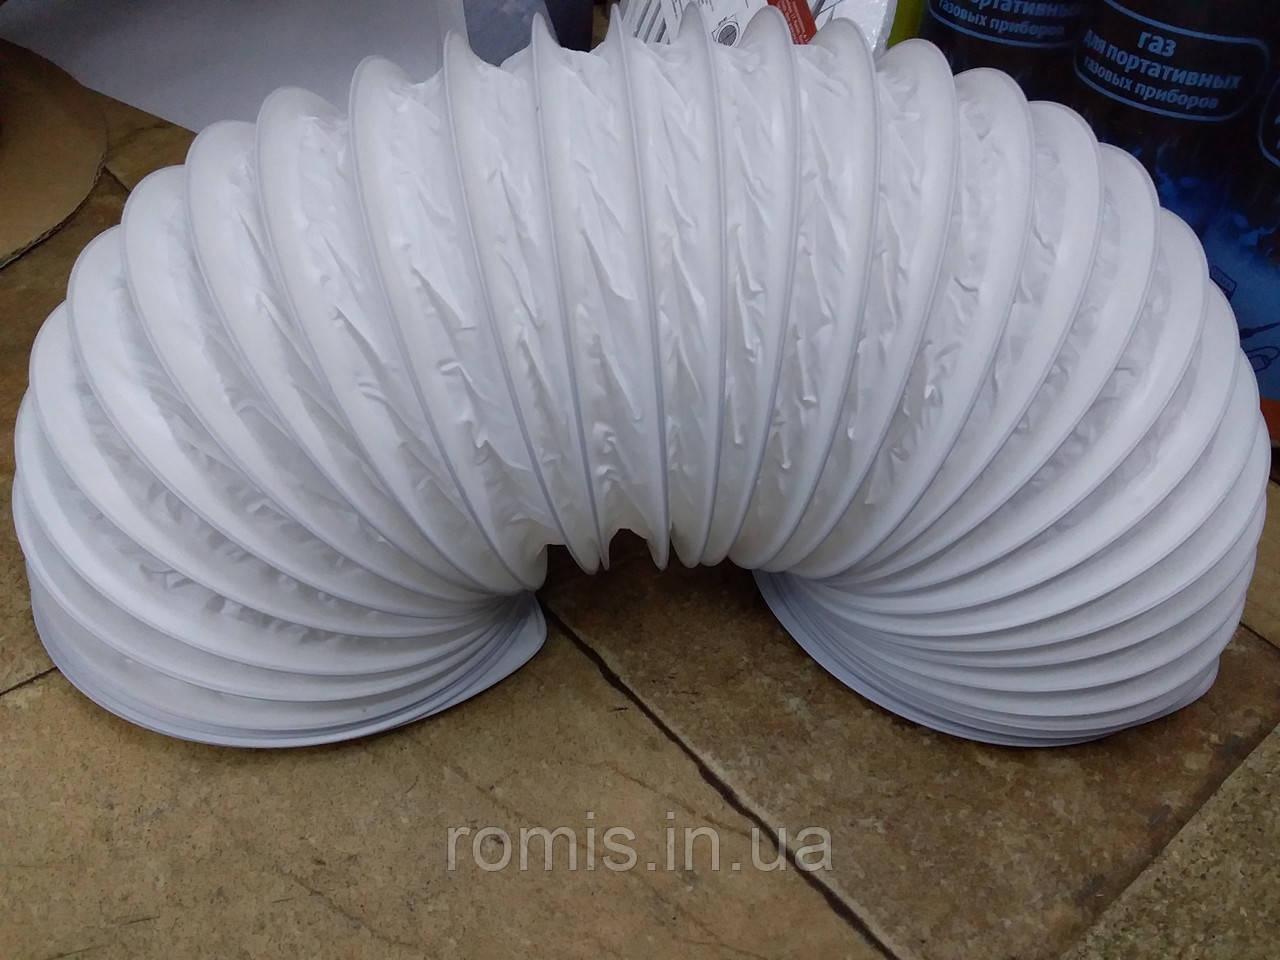 Воздуховод гибкий армированный ПВХ 150 мм. L=2 м